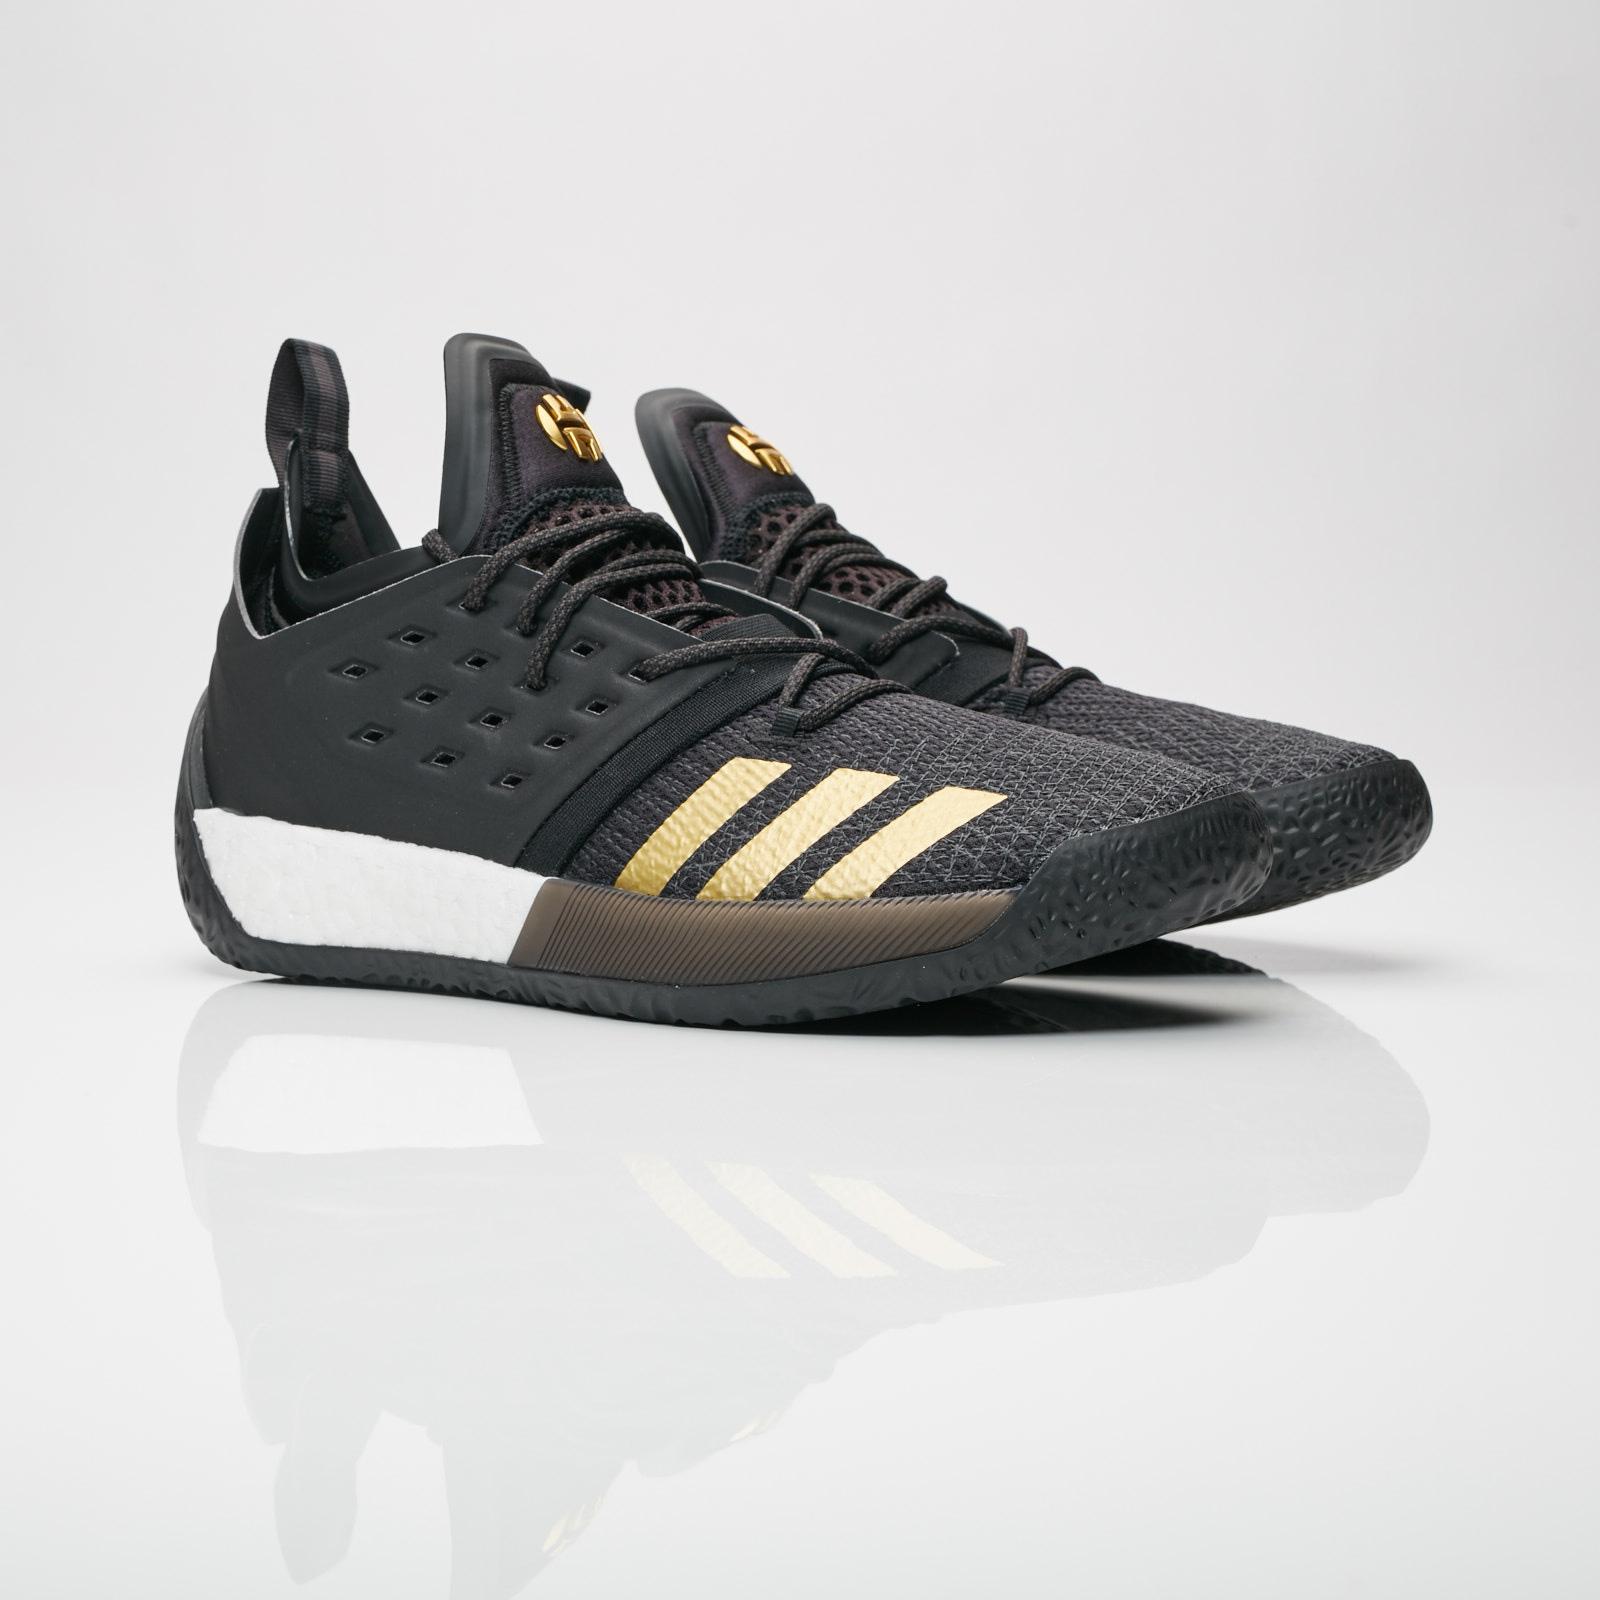 940f88a633f adidas Harden Vol. 2 - Ah2215 - Sneakersnstuff